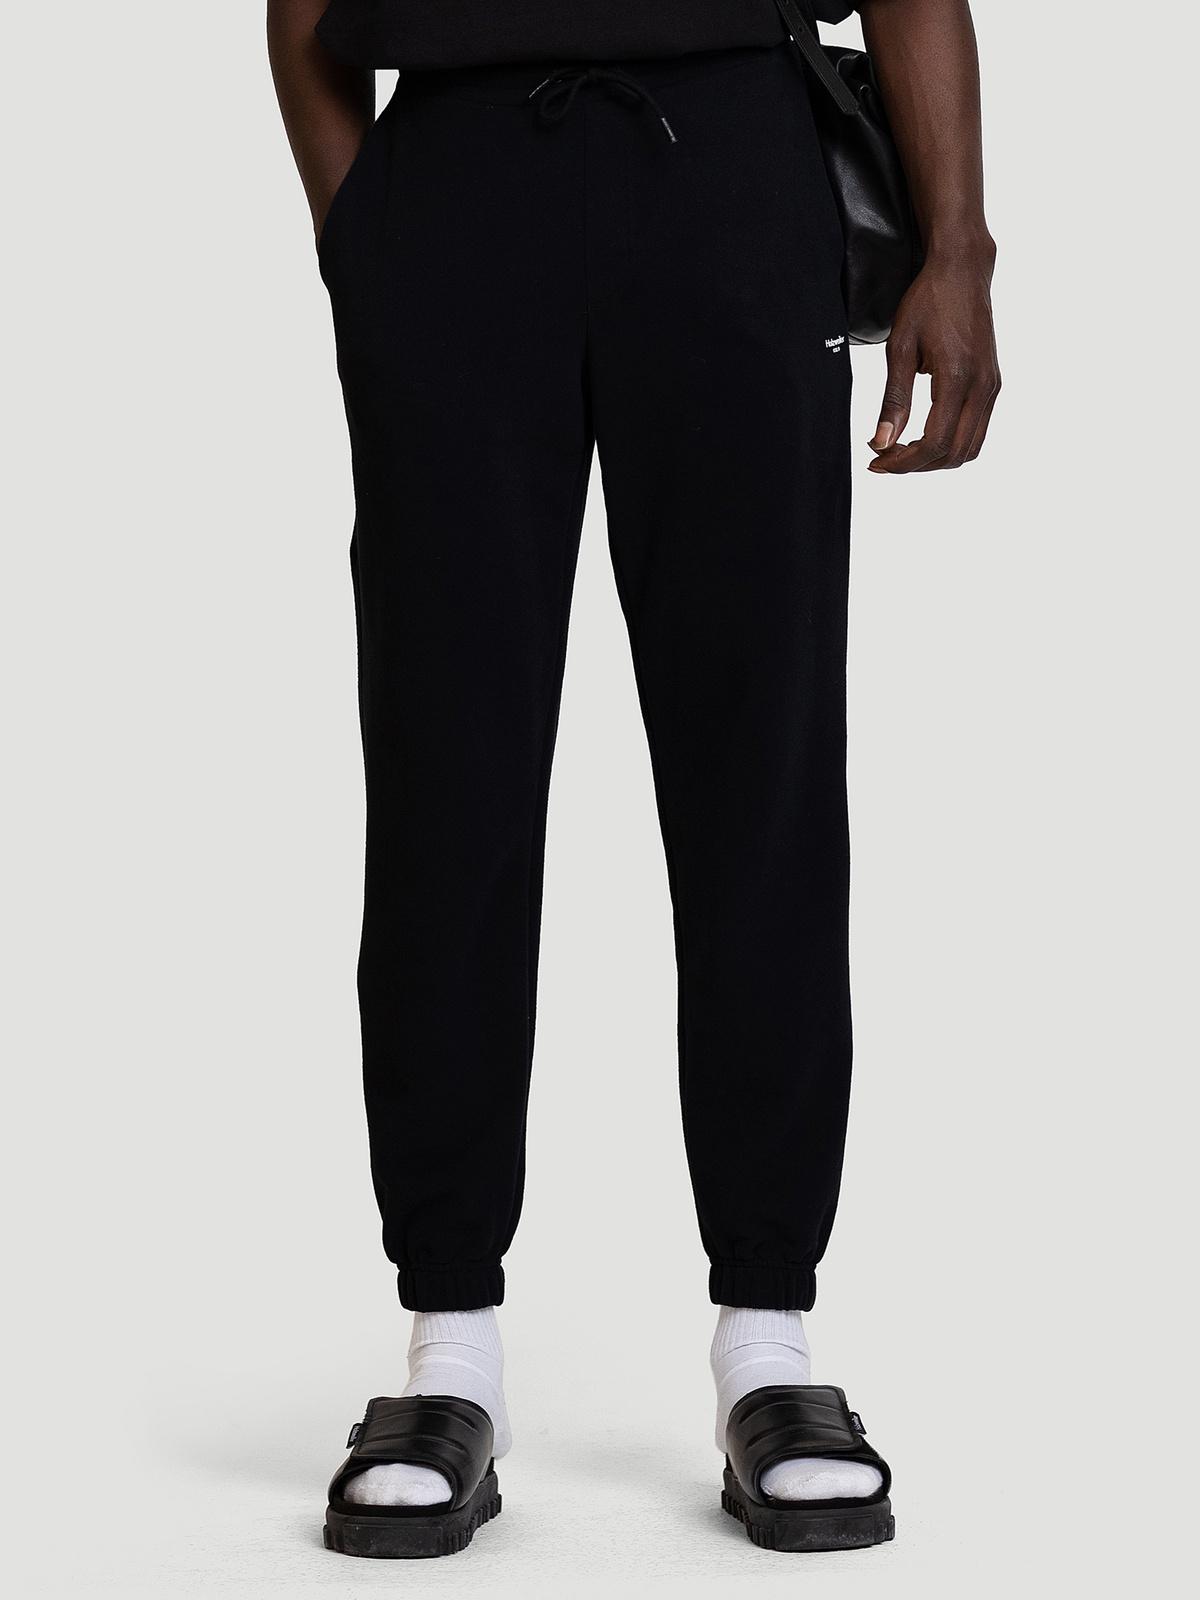 M. Oslo Sweat Trouser Black 4